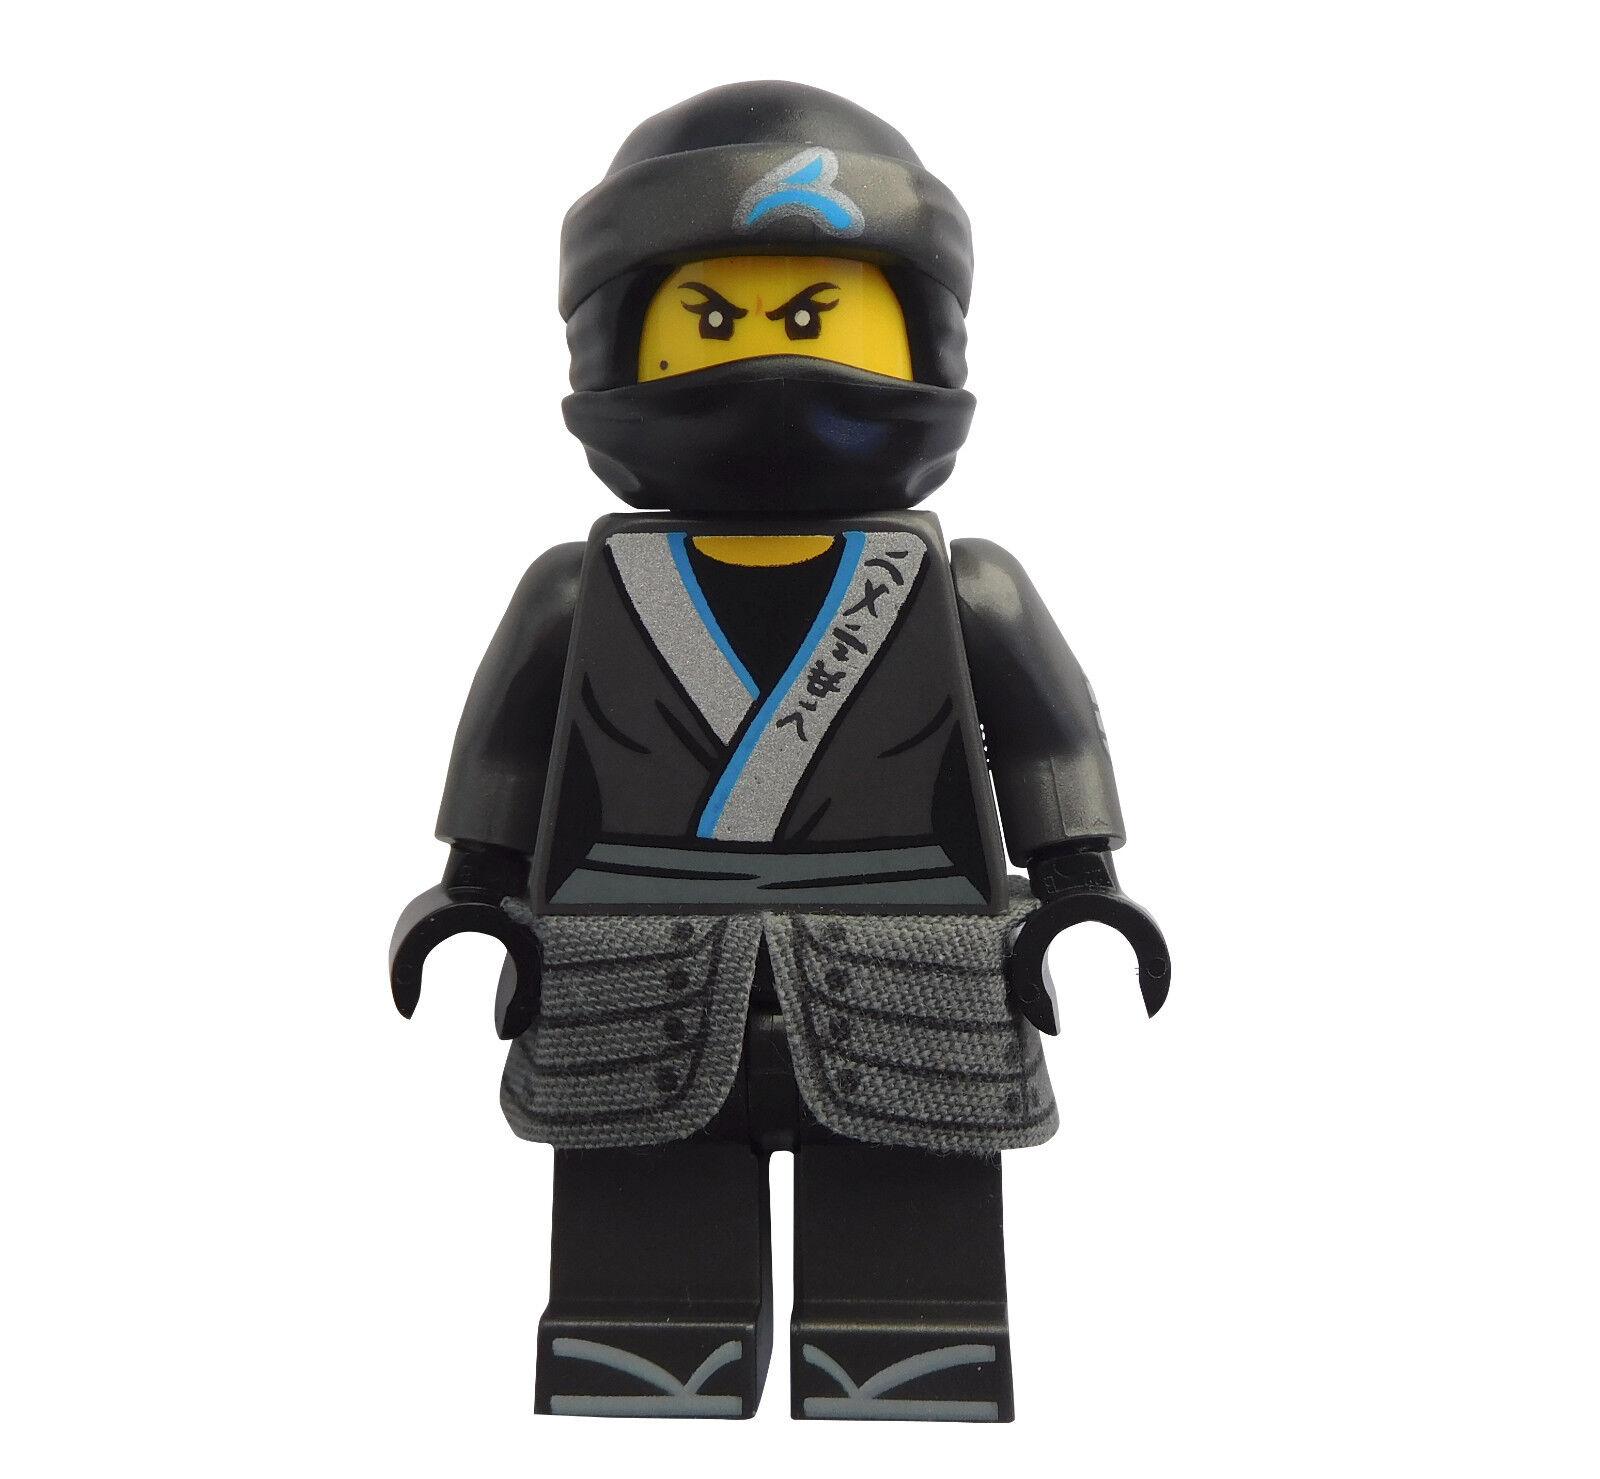 Lego Cyren Ninjago Ninja Minifigur Figur Legofigur Minifig Njo219 Neu Spielzeug Lego Minifiguren